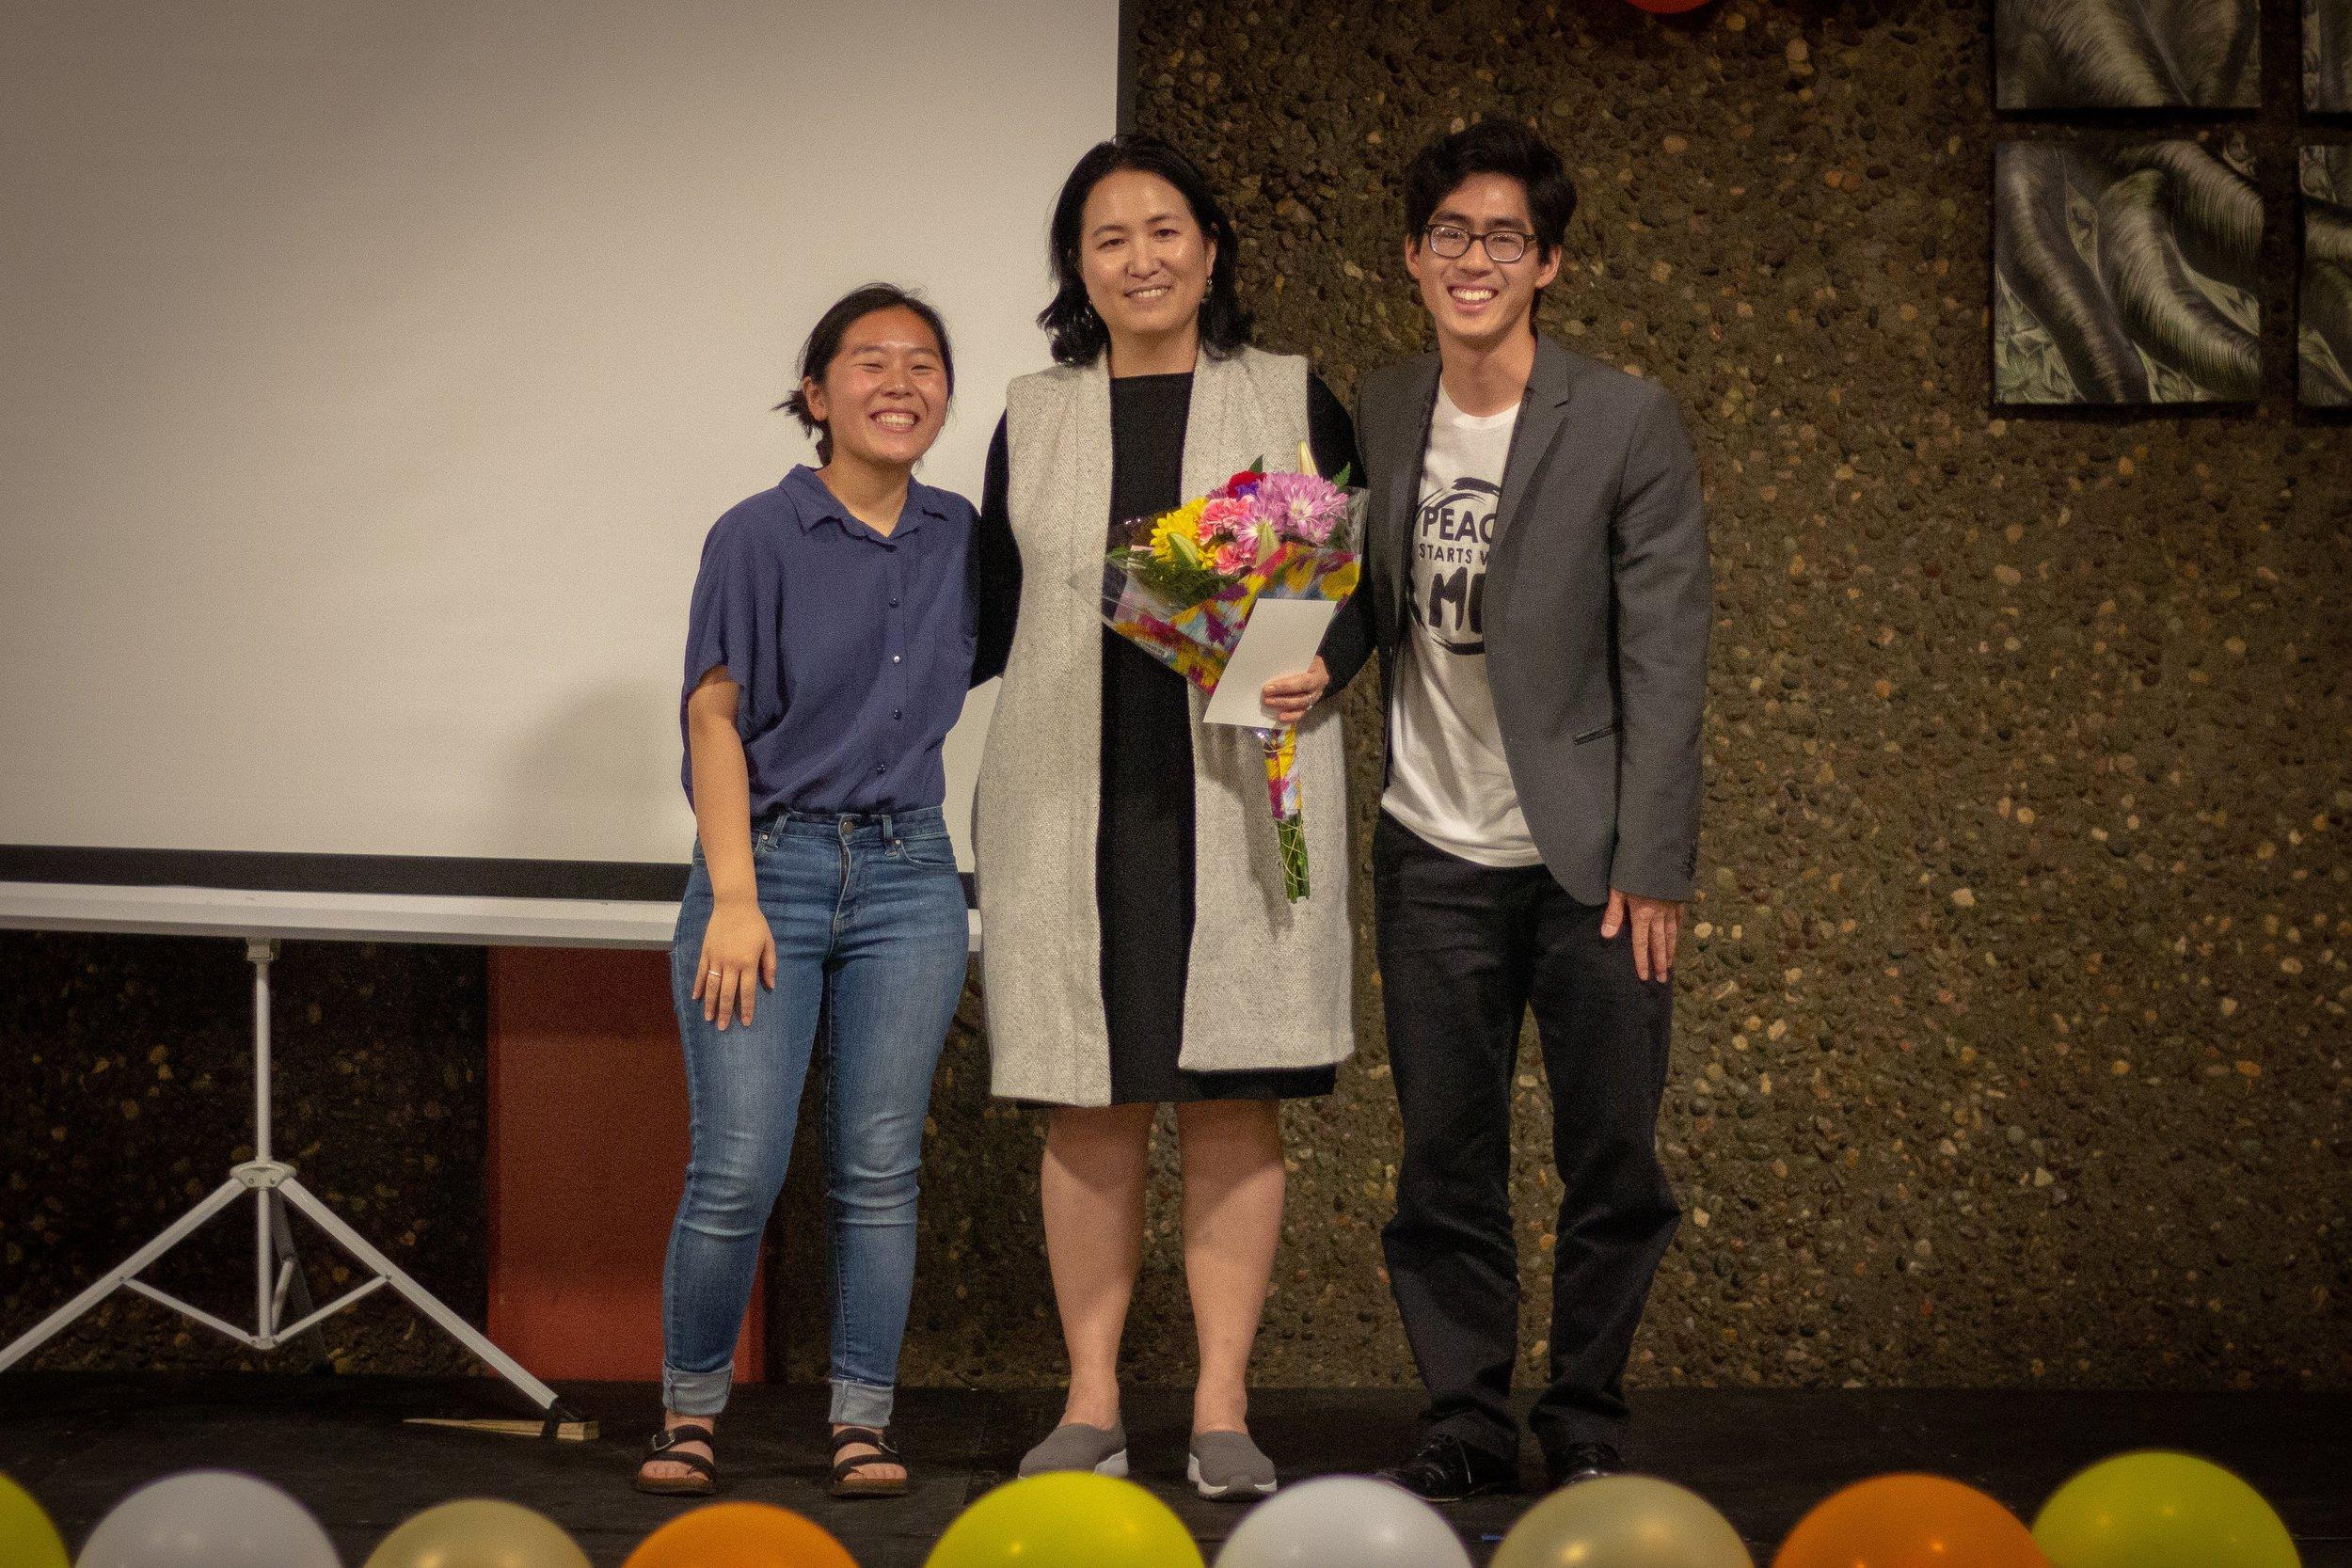 CARP Bay Area honored their faculty advisor, Professor Ukudeeva.